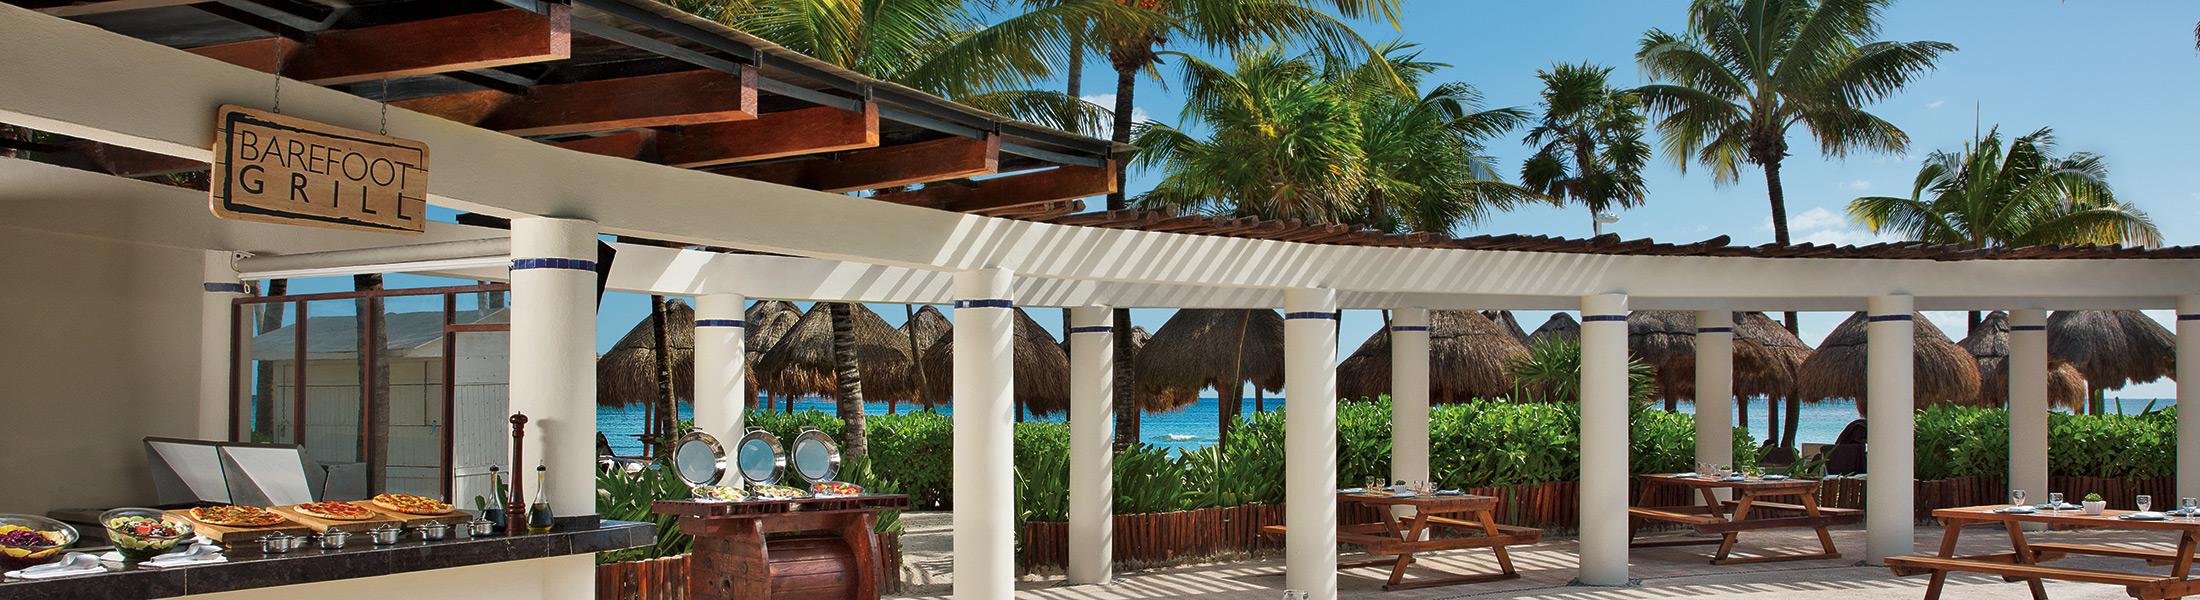 Outdoor dining at Dreams Tulum Resort & Spa